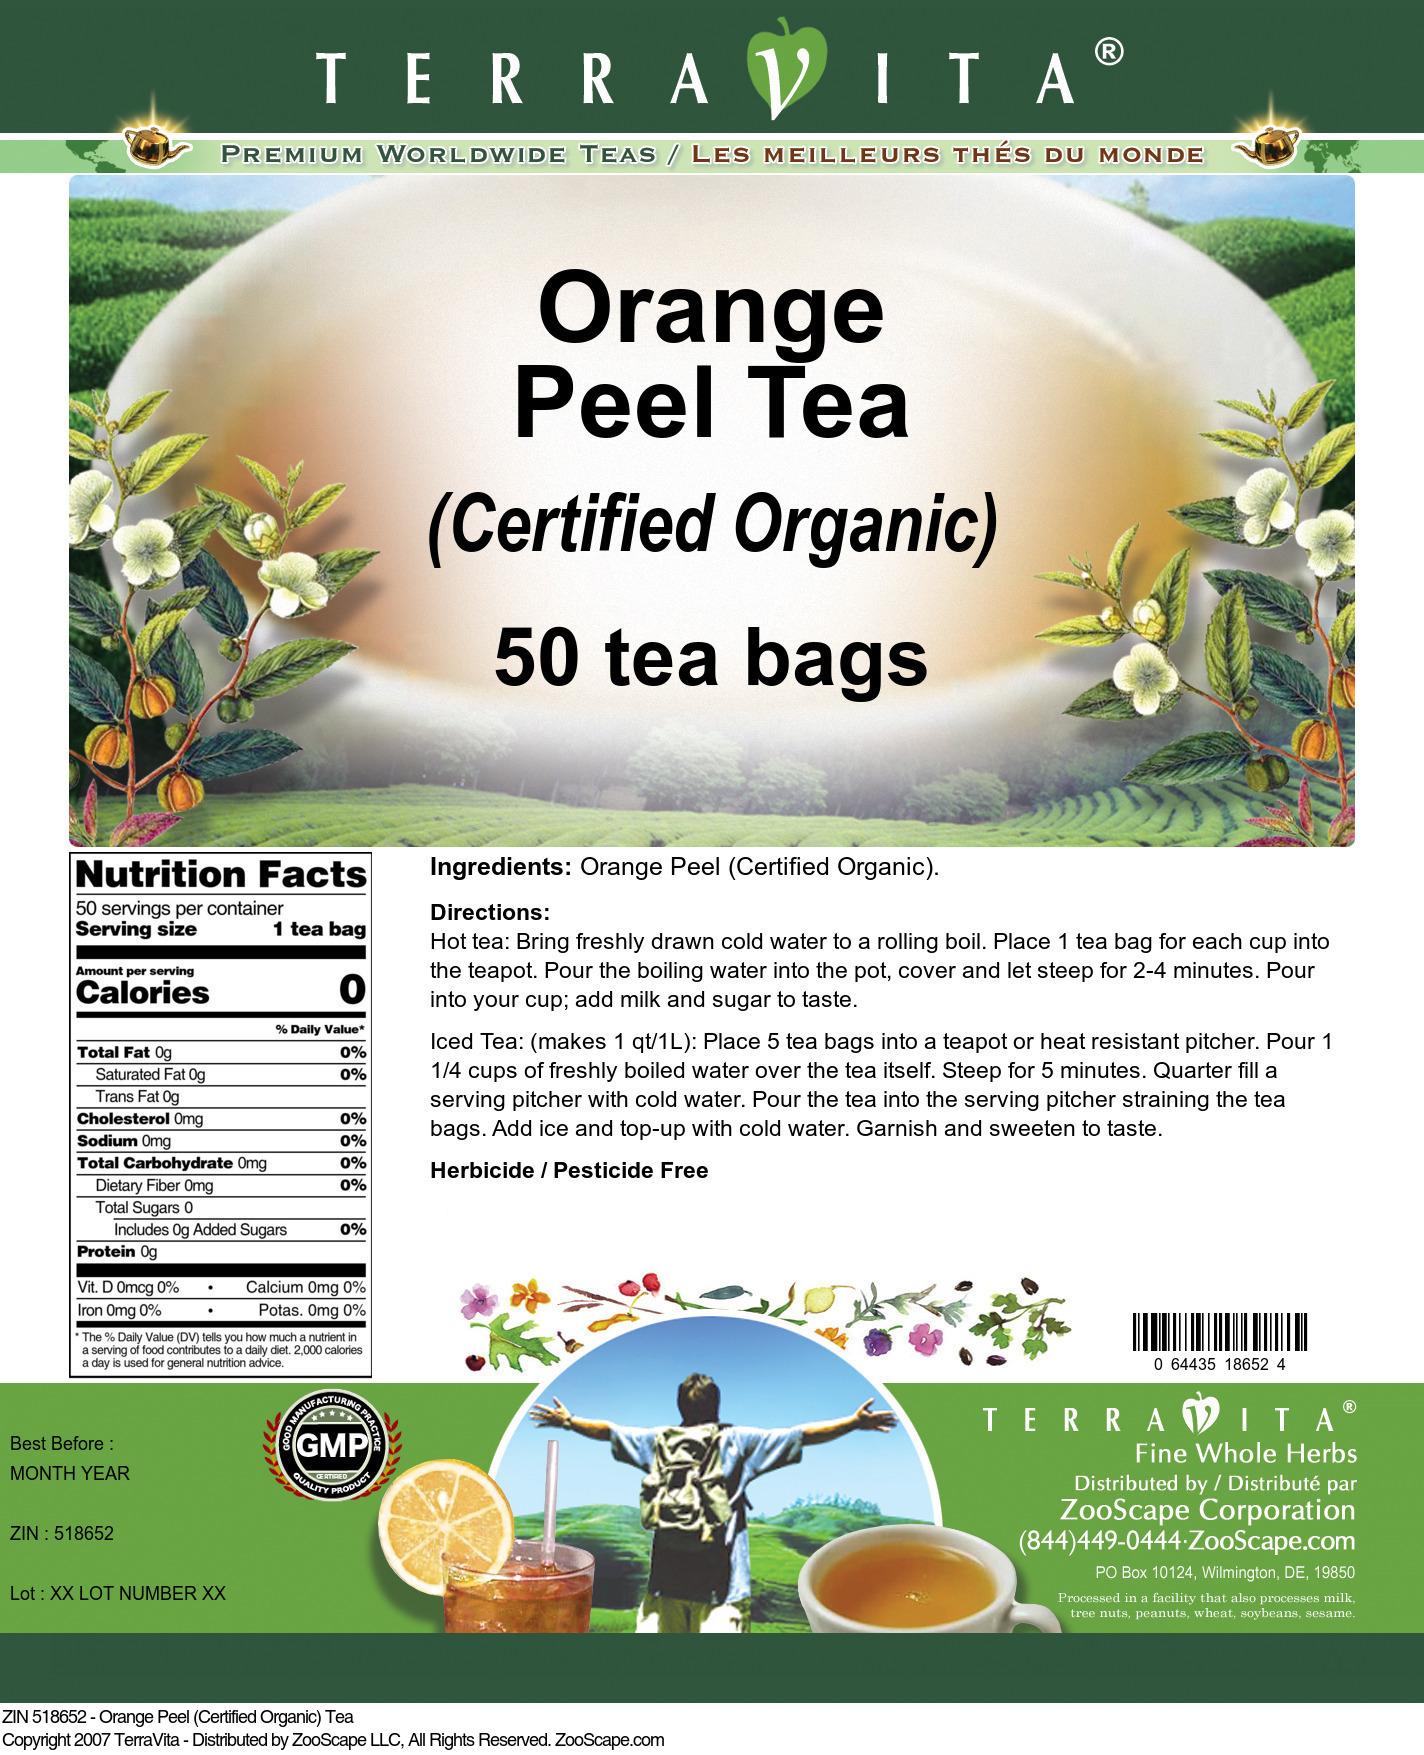 Orange Peel (Certified Organic) Tea